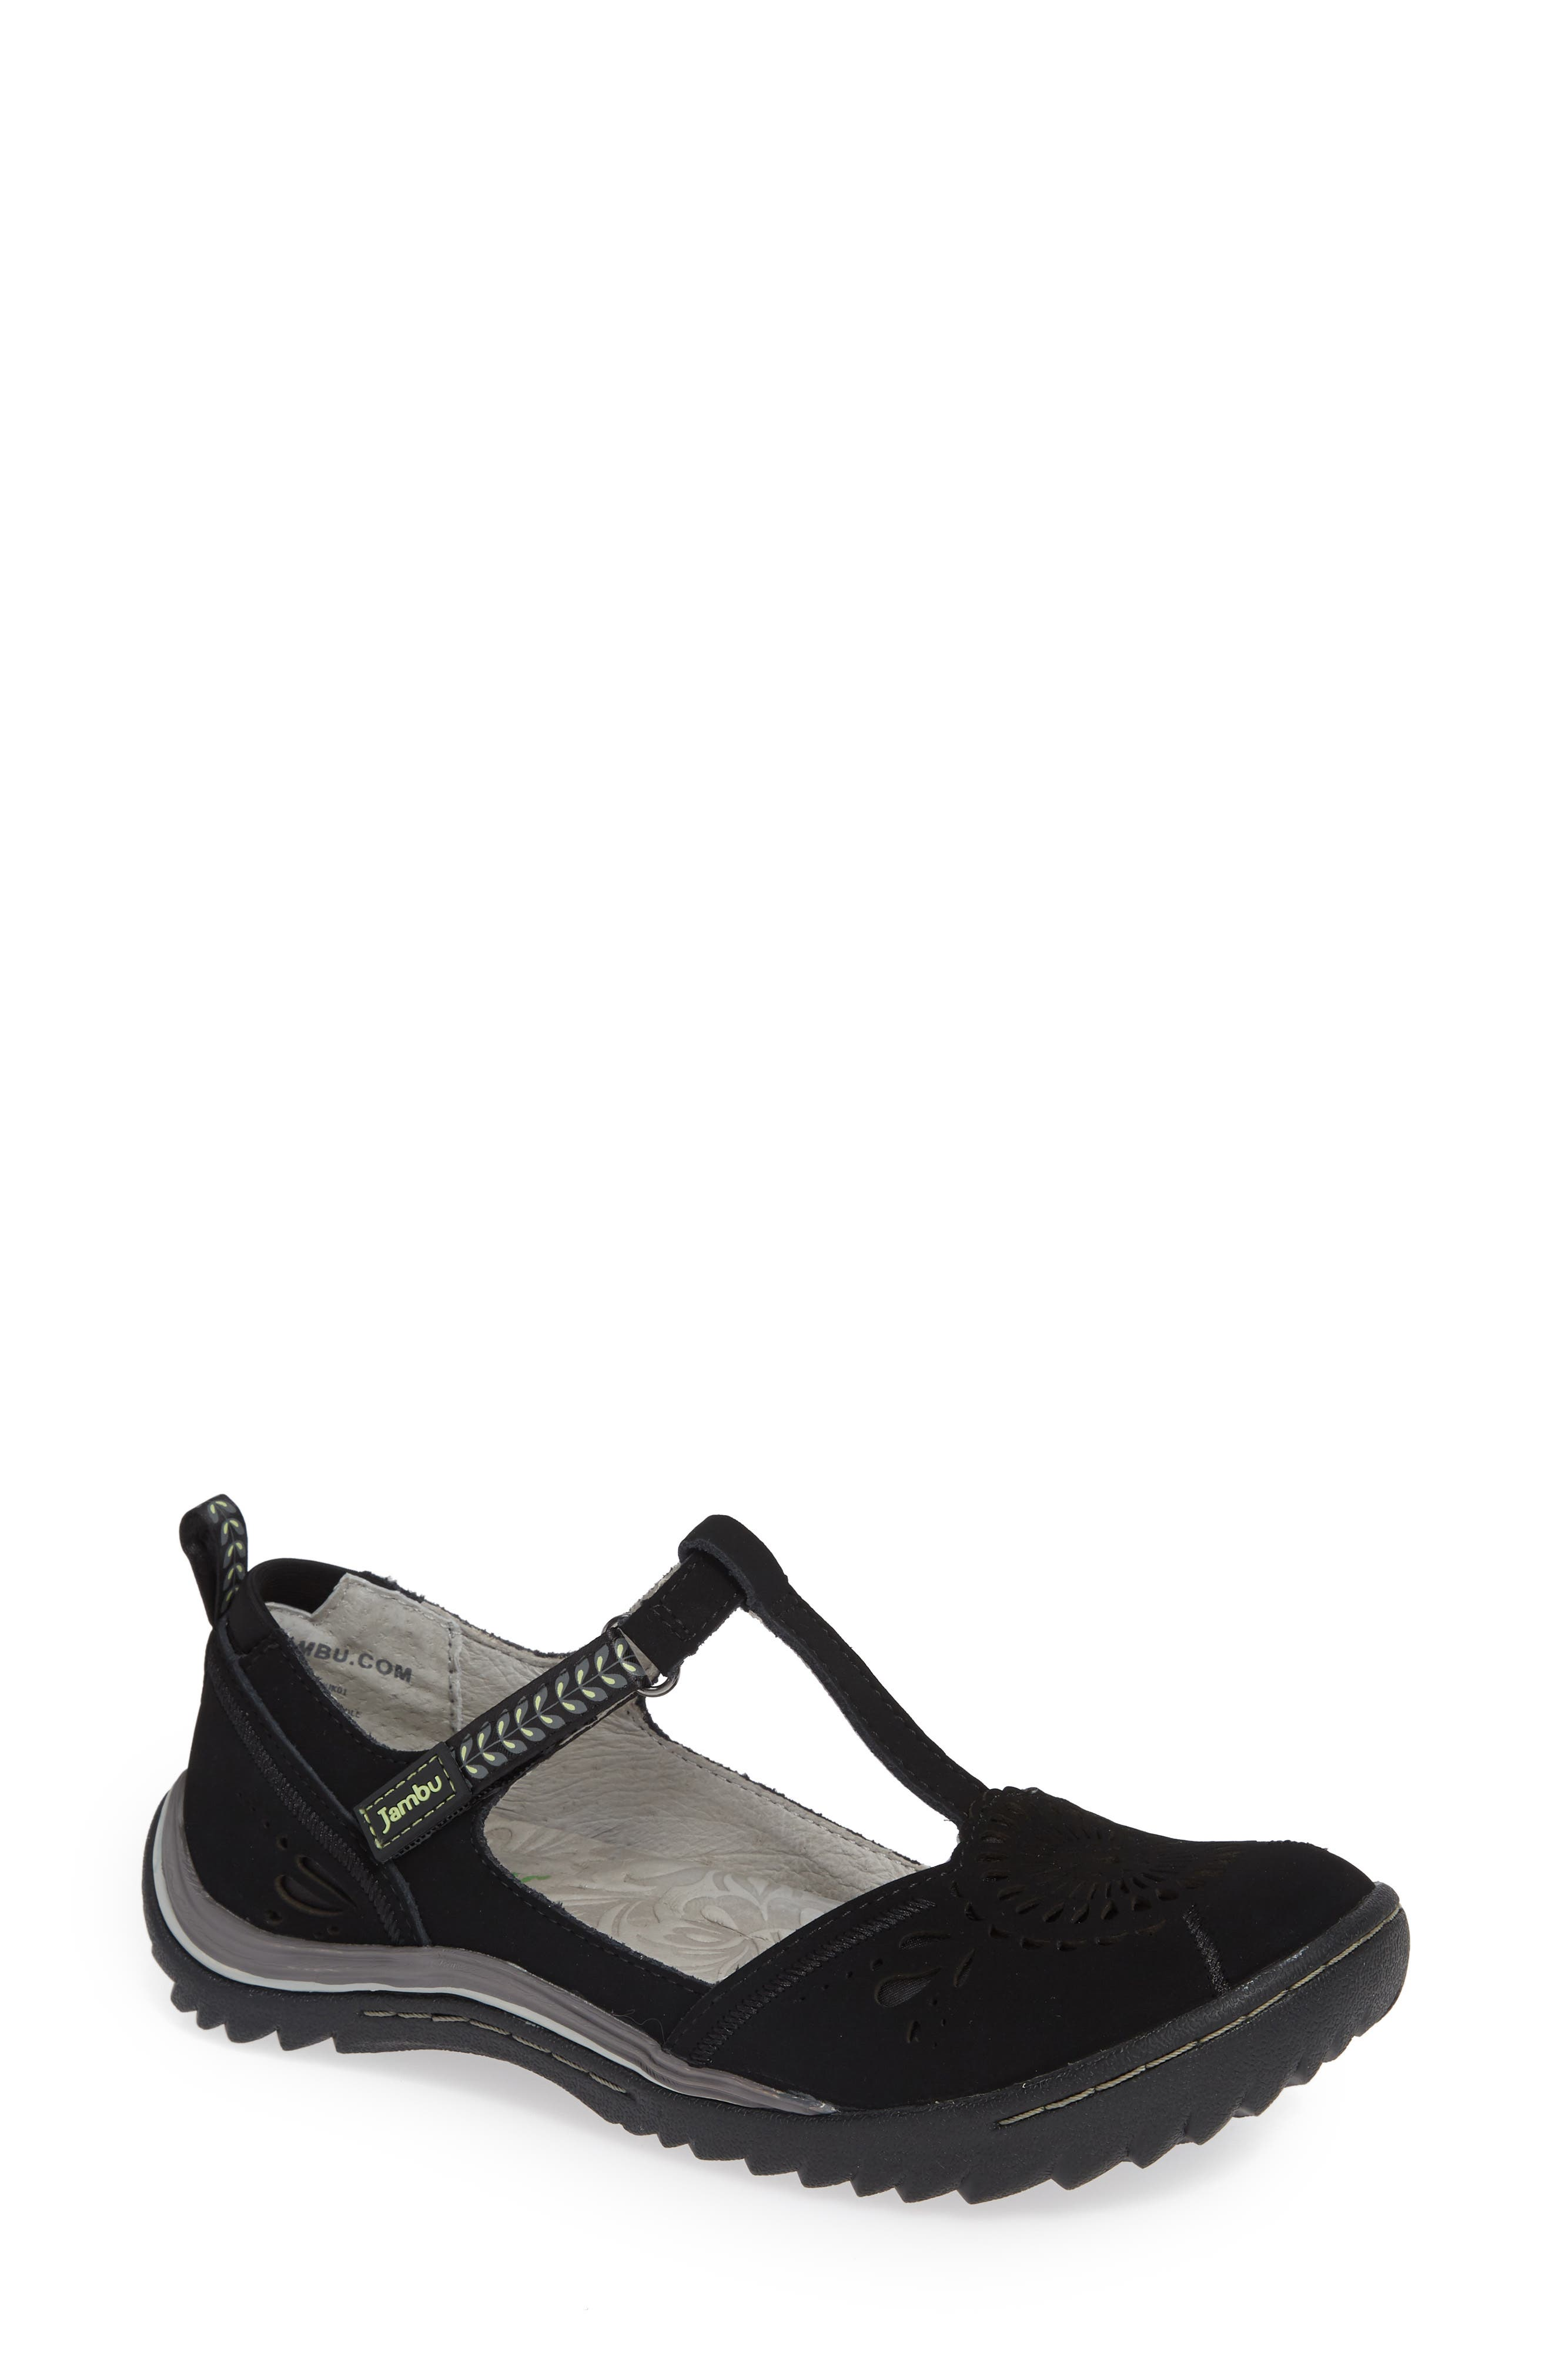 Jambu Sunkist Strappy Sneaker, Black